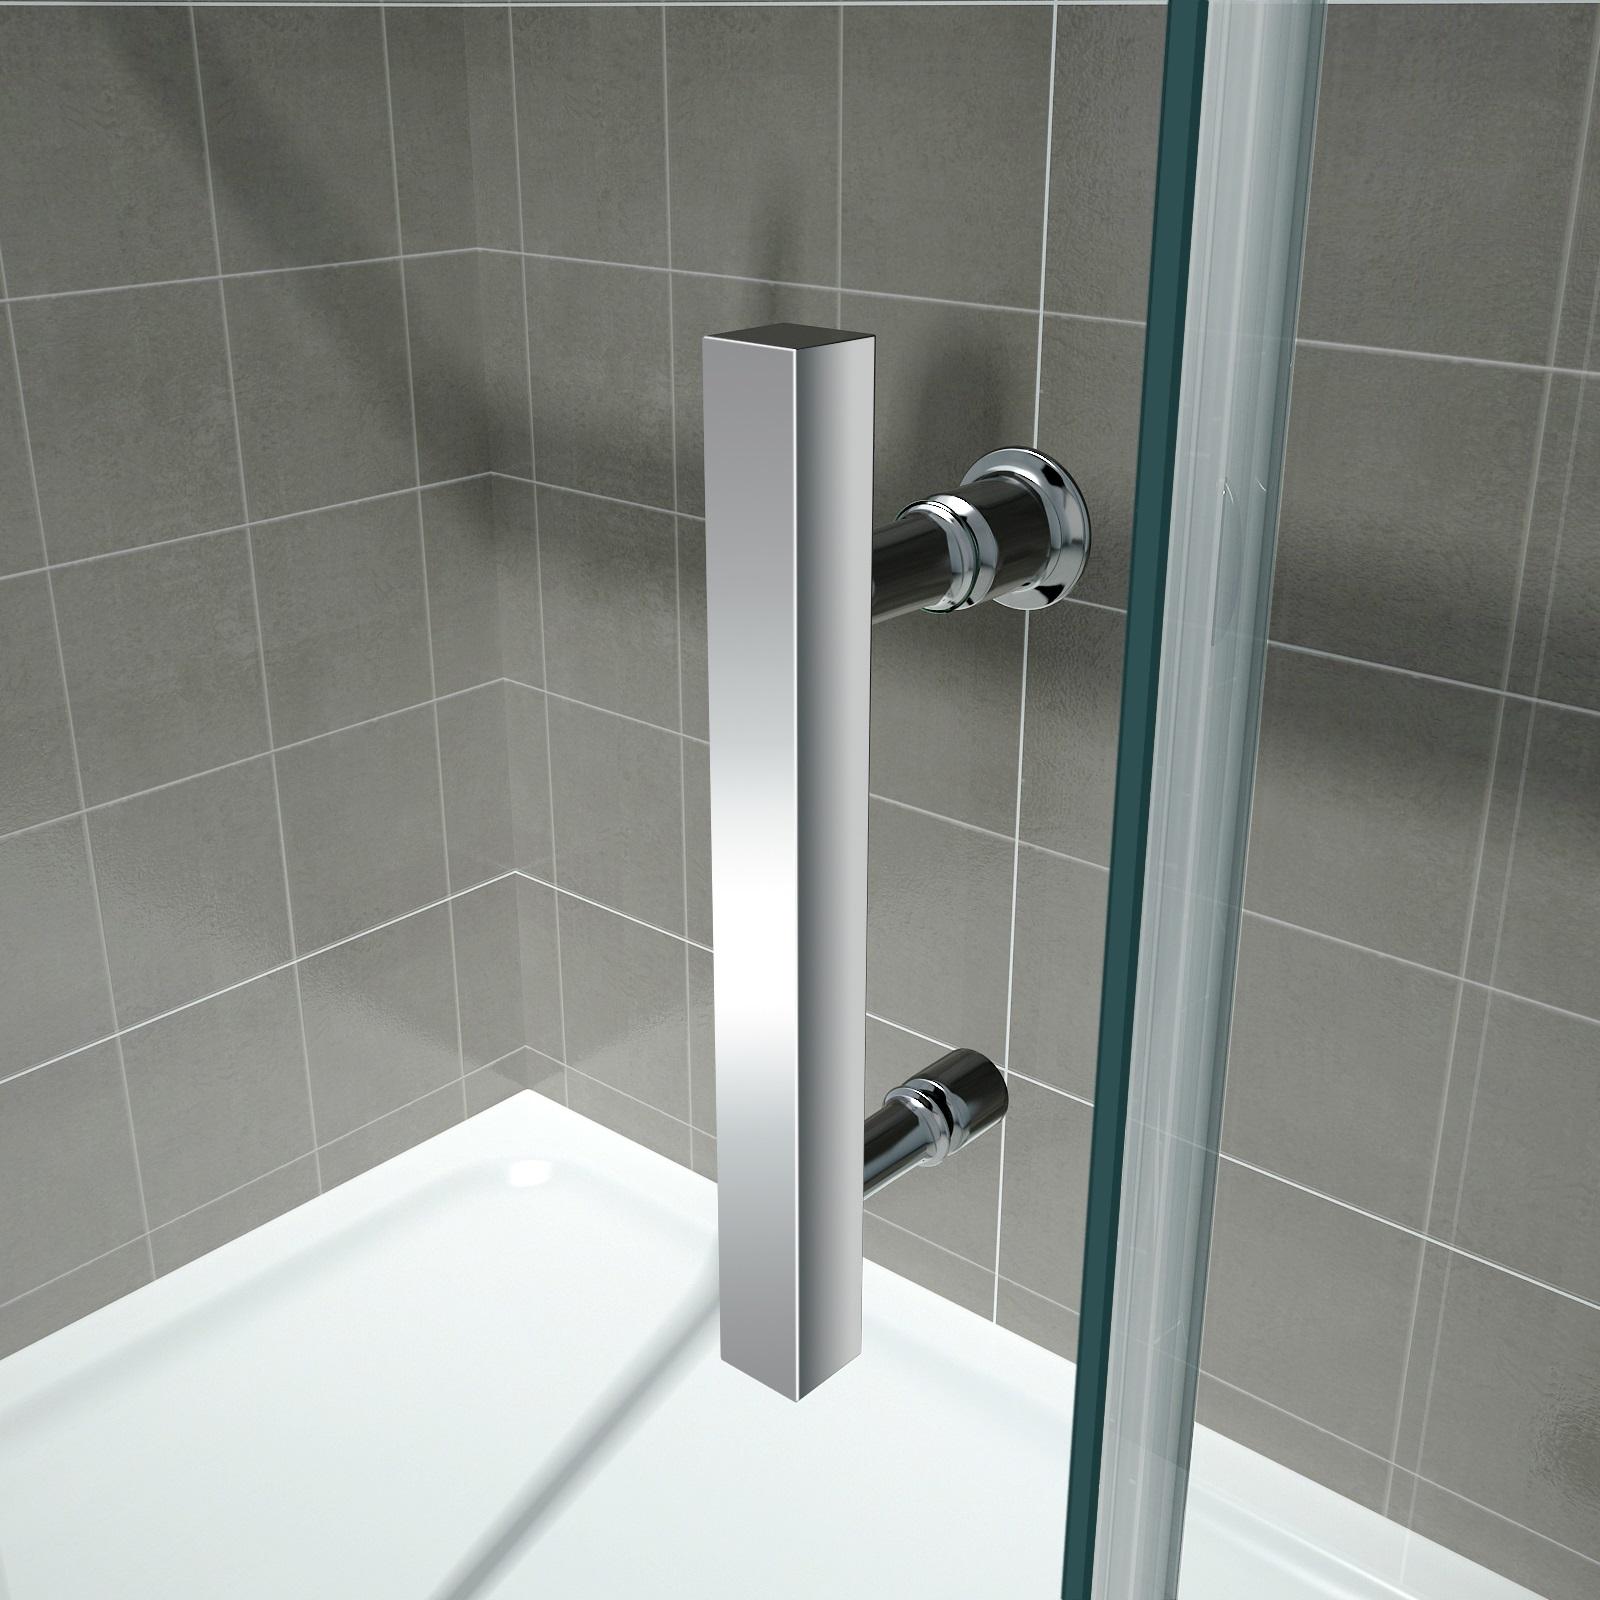 DK06 - 100x130 cm - Tür: 130 cm